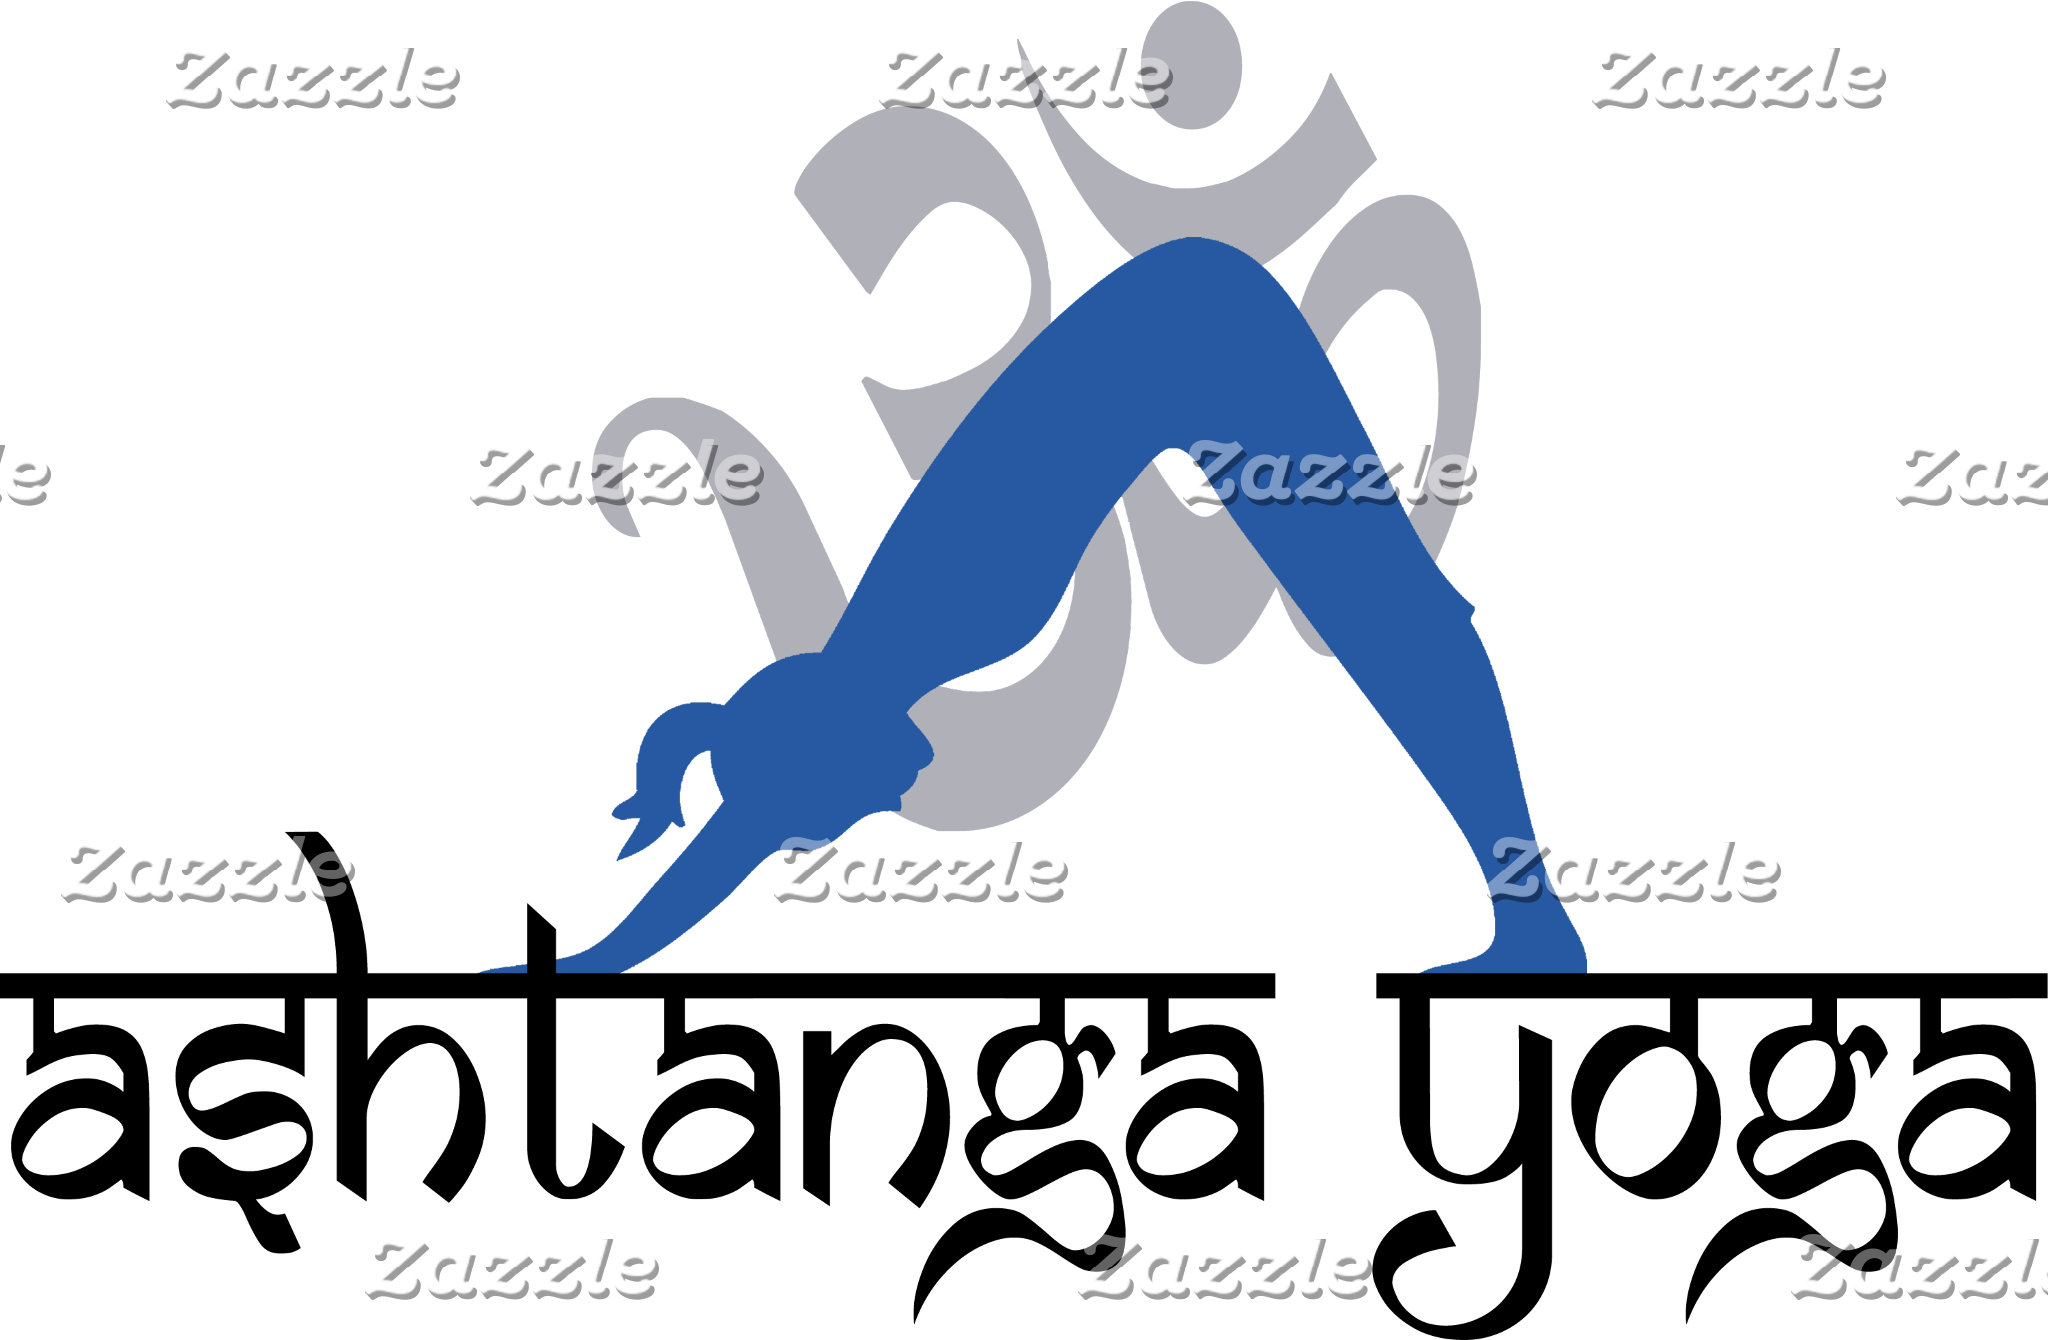 Ashtanga Yoga T-Shirts Gifts Cards